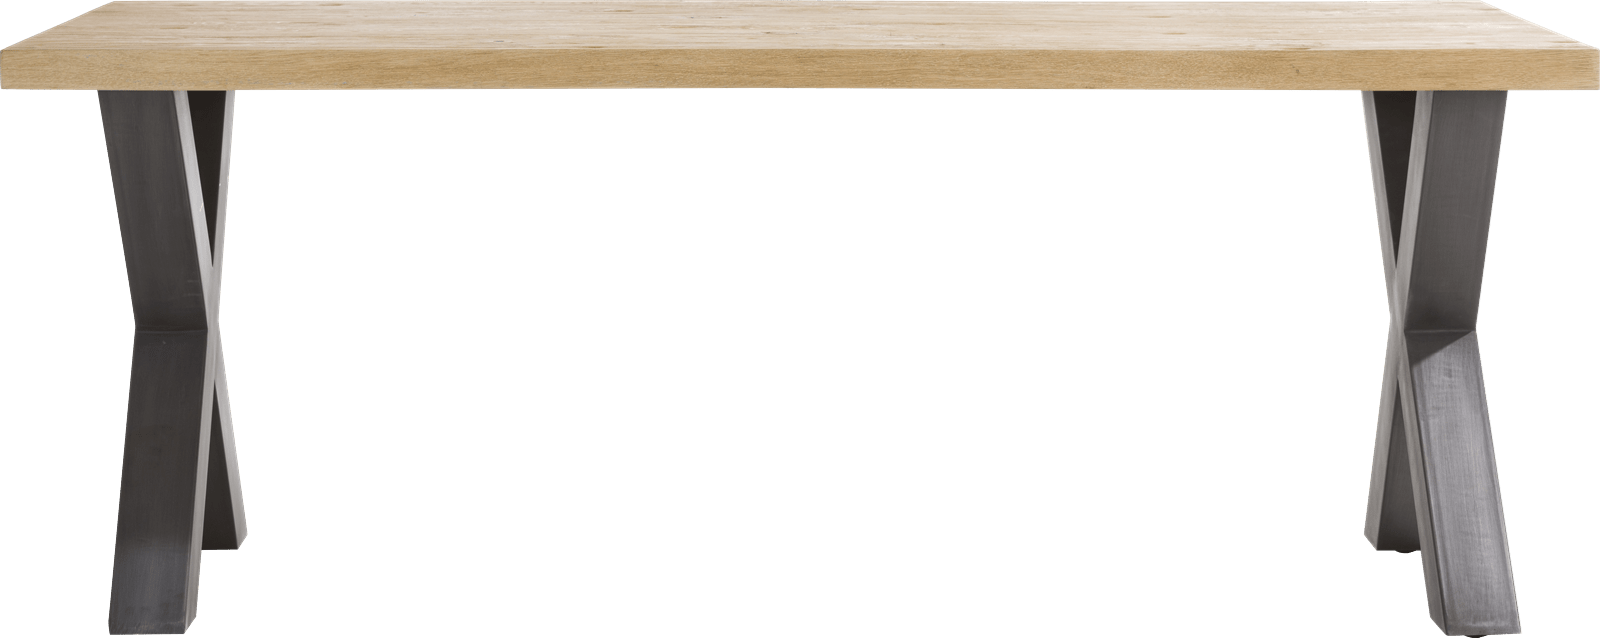 Henders and Hazel - Metalox - Industrieel - eetkamertafel 170 x 100 cm